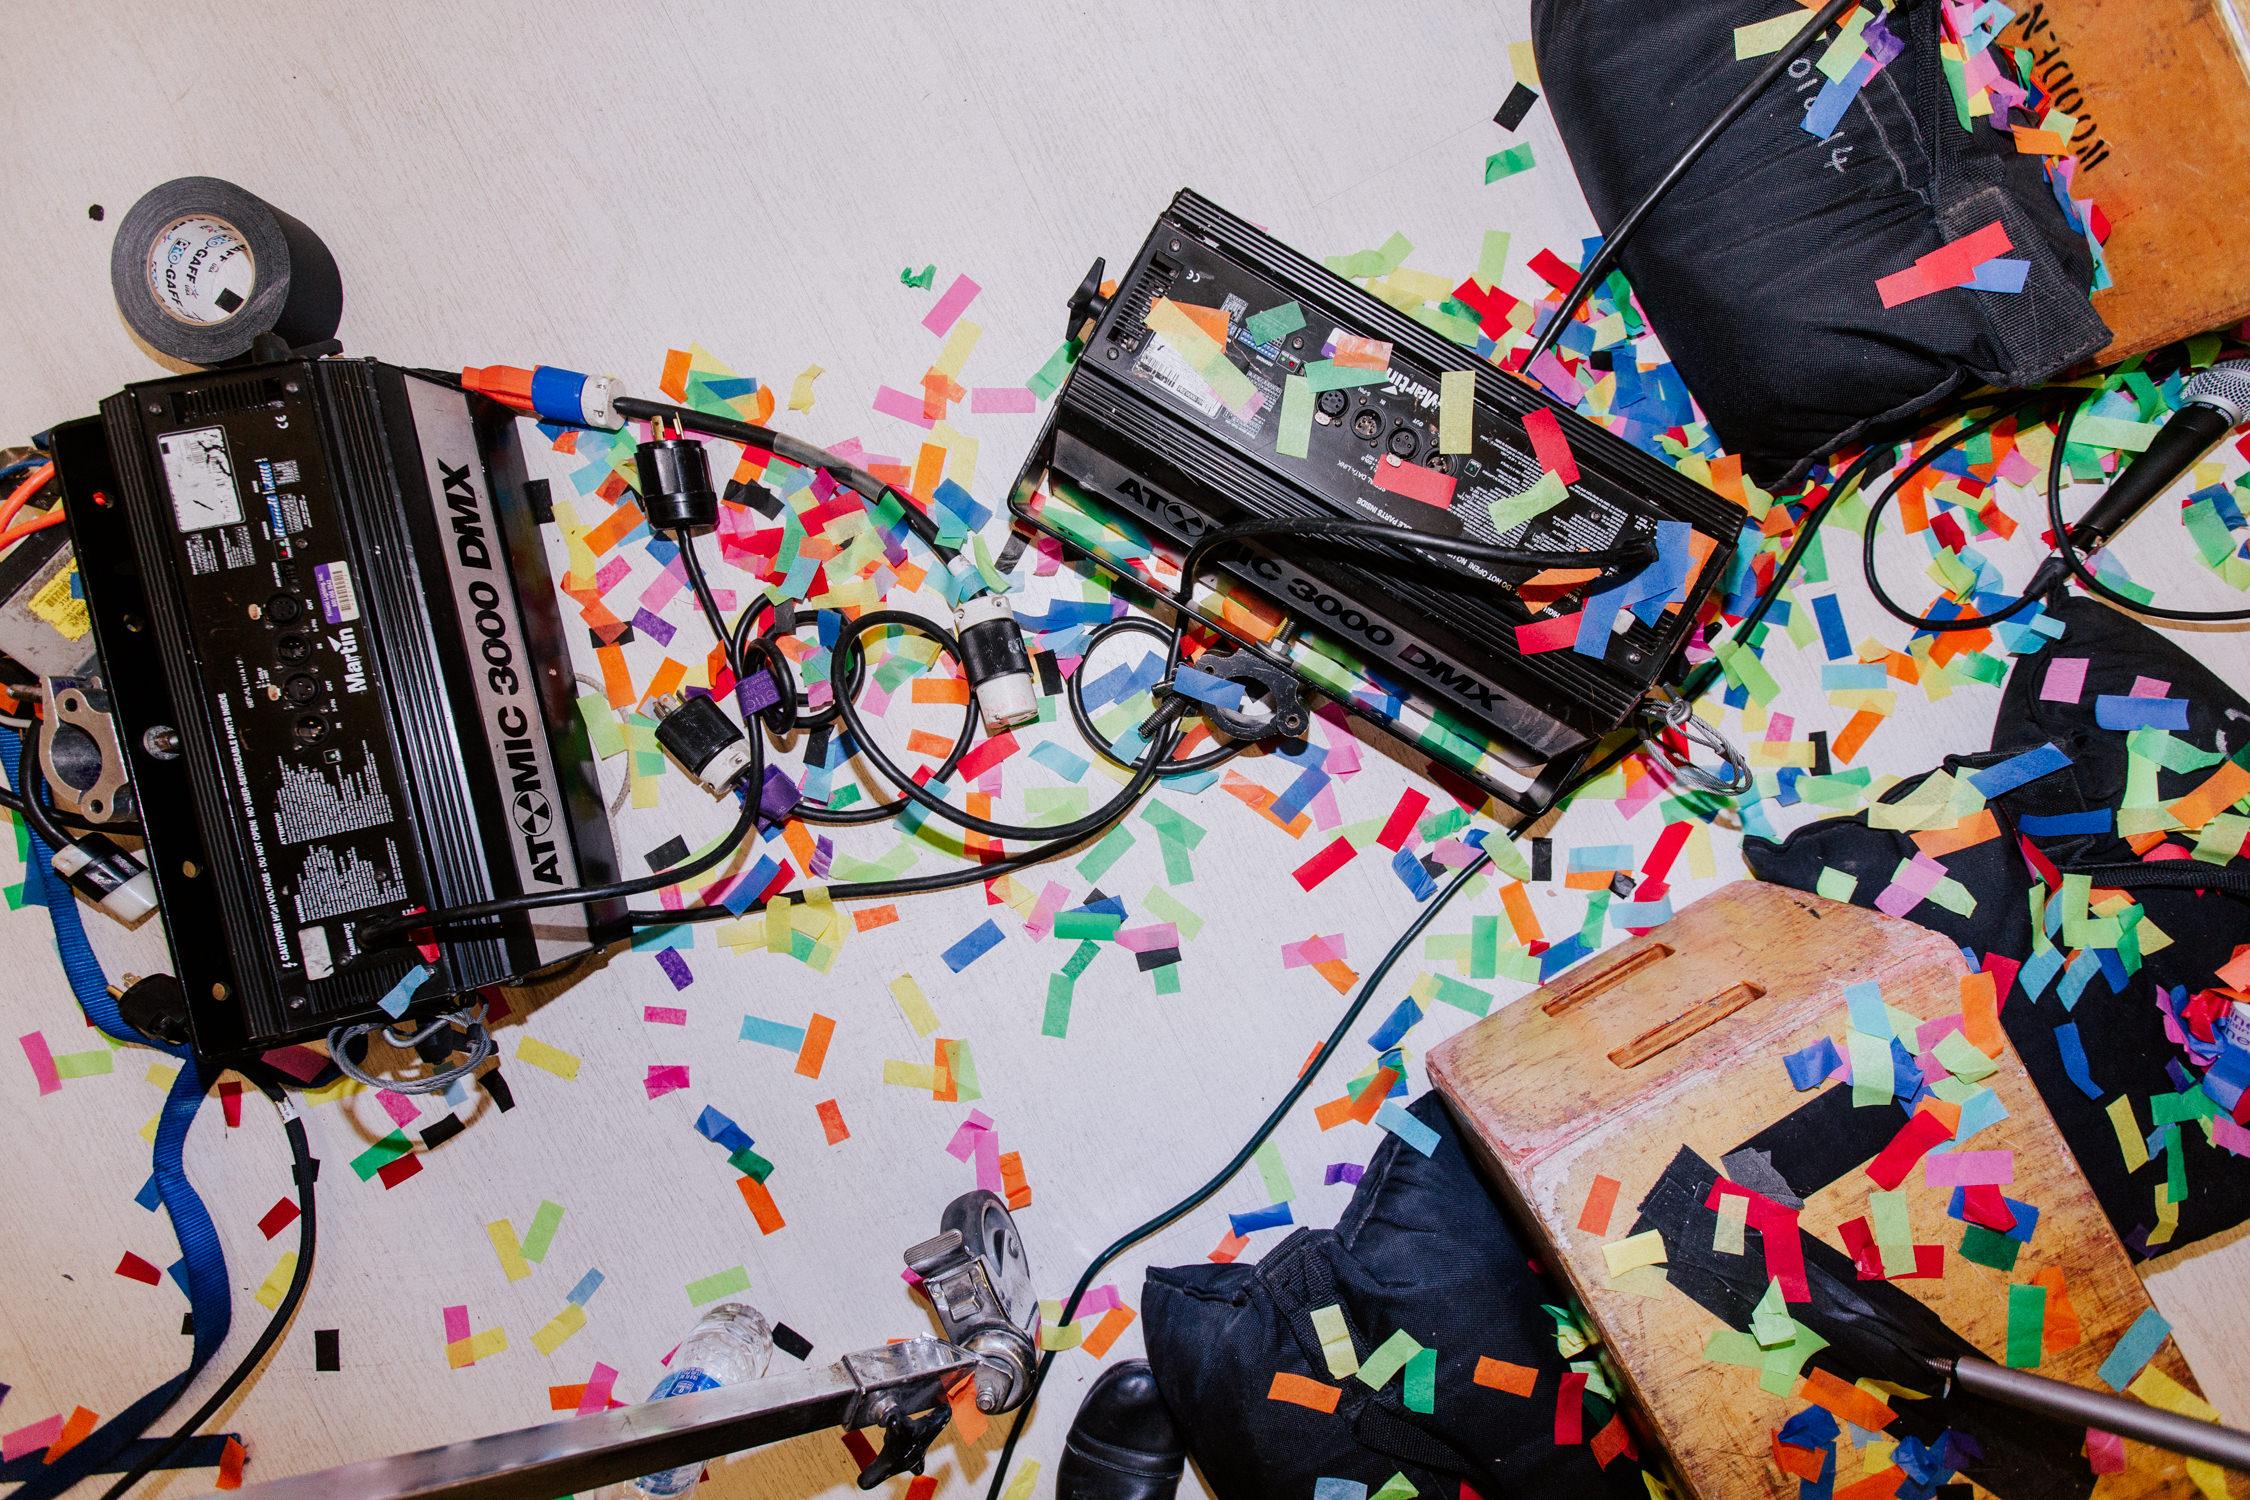 music-video-bts-confetti-AnnaLeeMedia